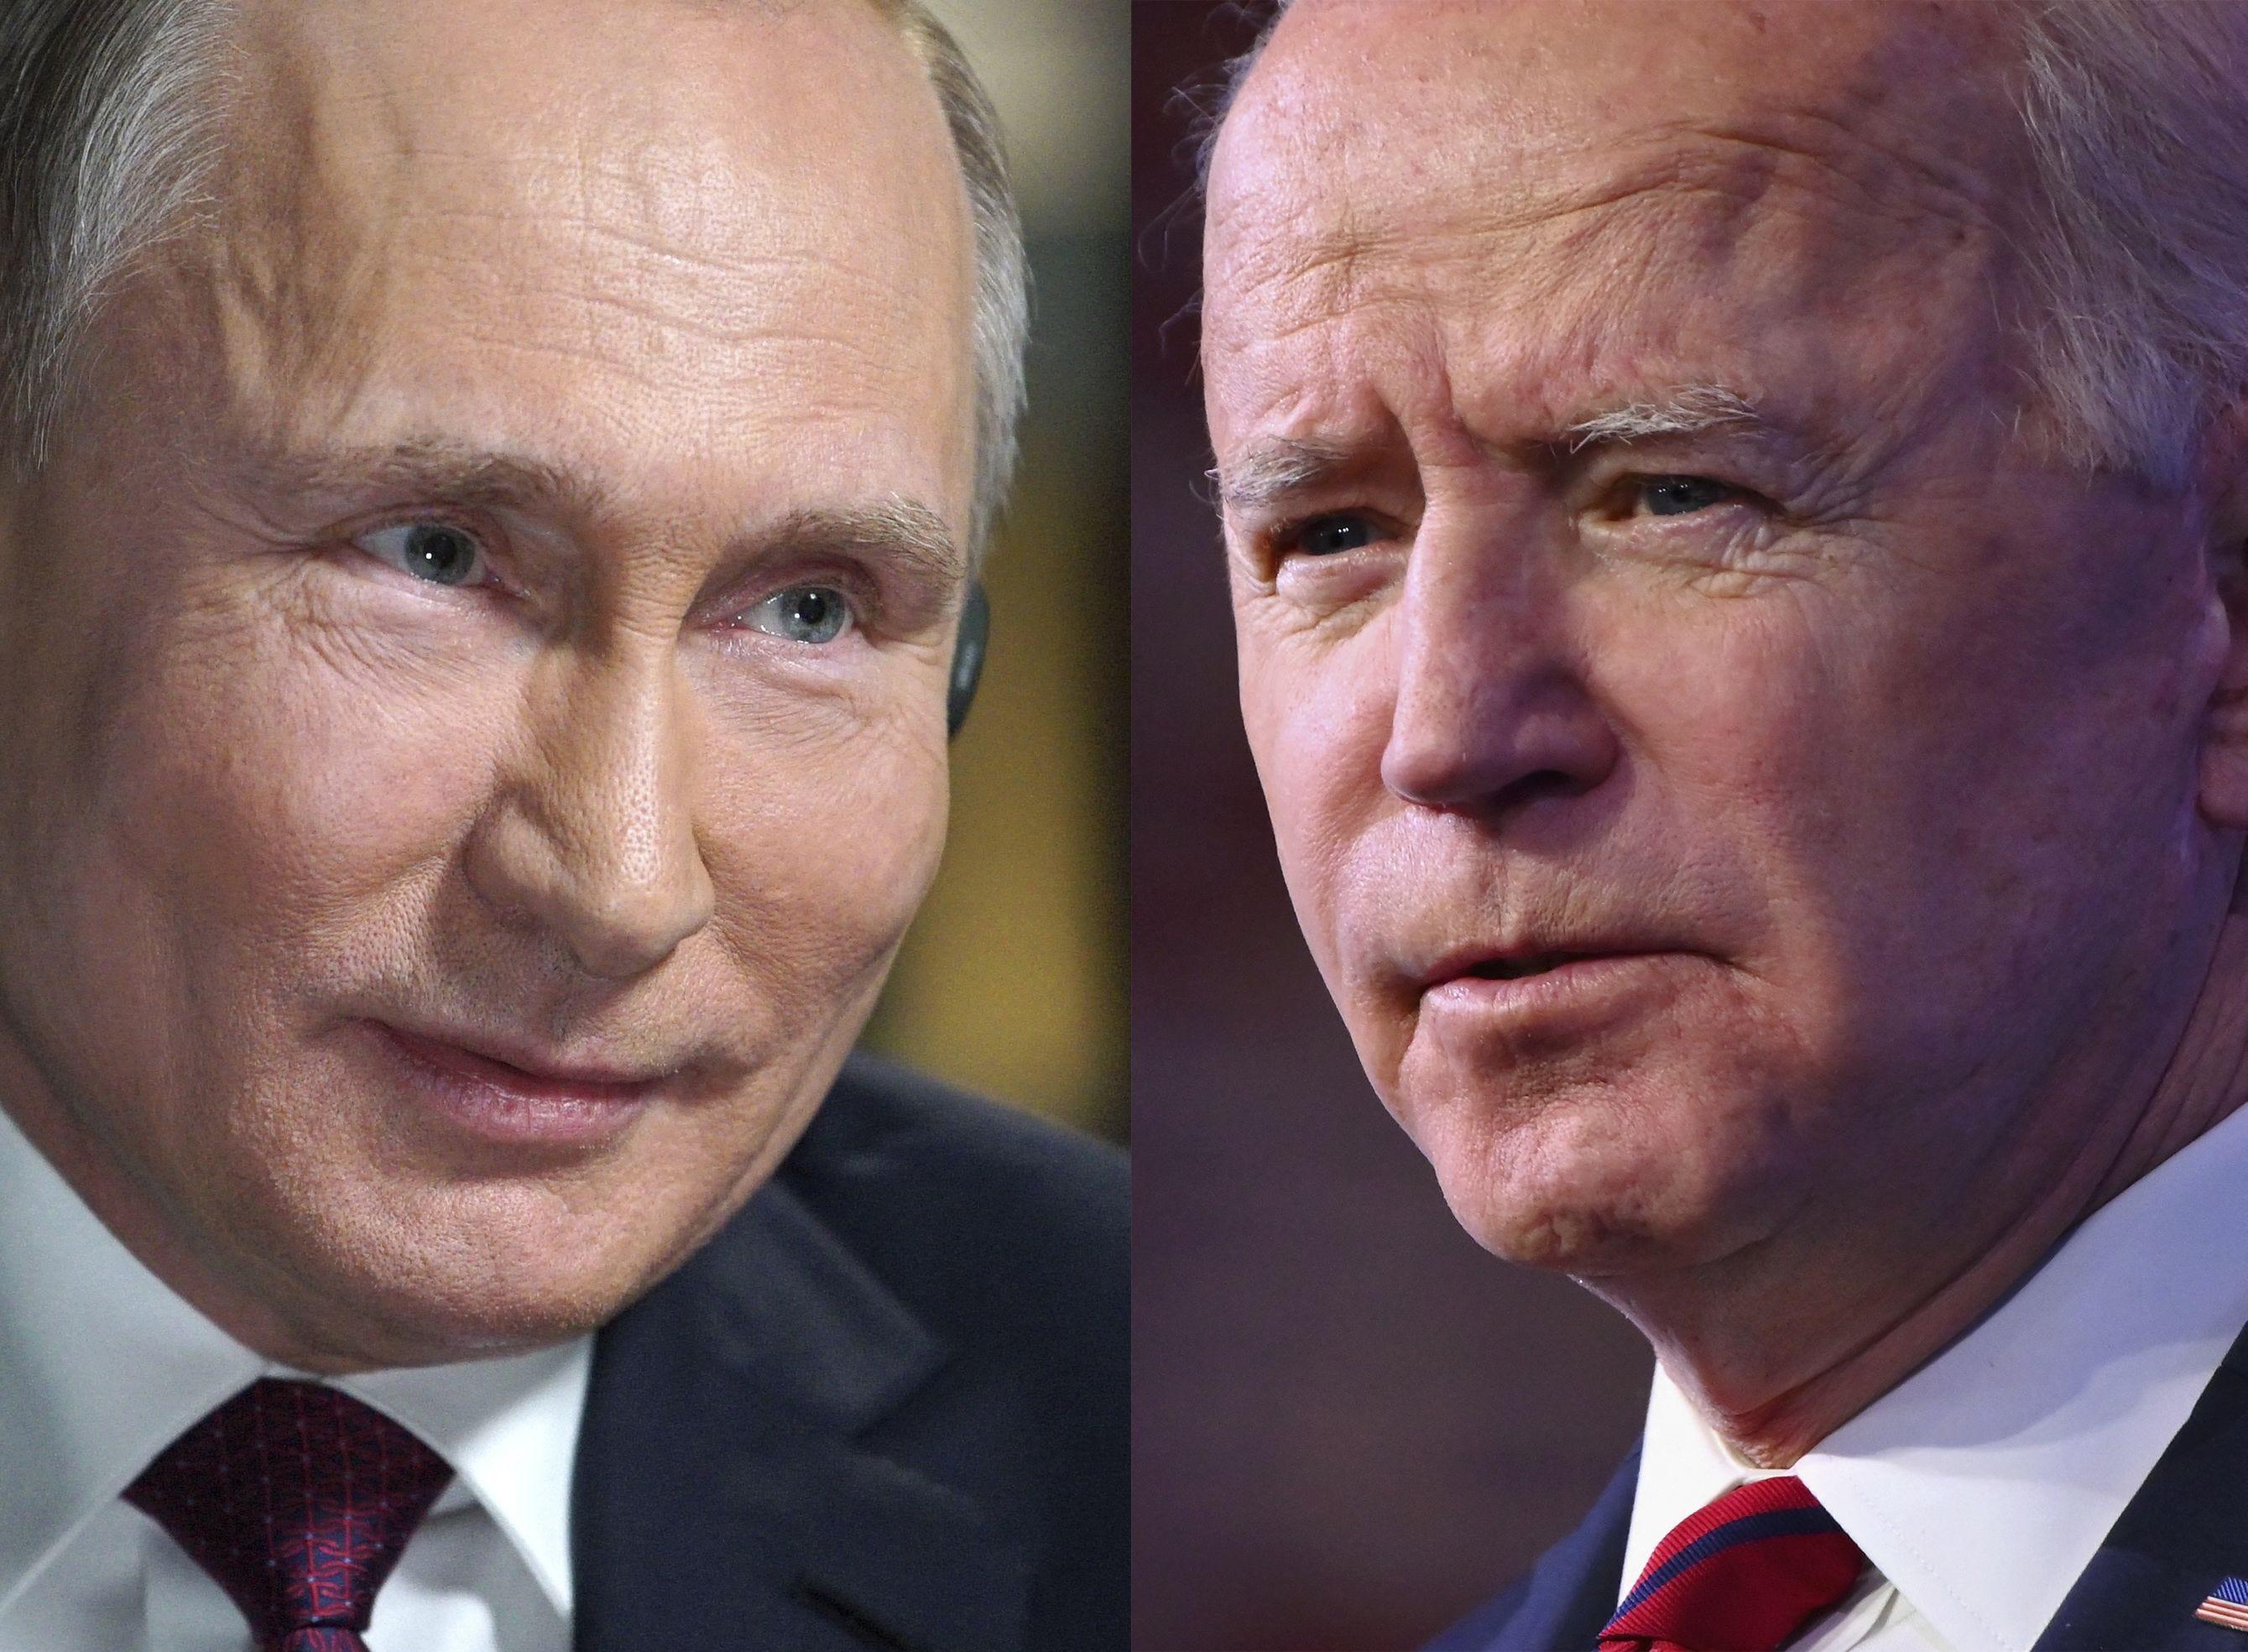 Joe Biden set for Geneva showdown with Vladimir Putin after European tour of allies